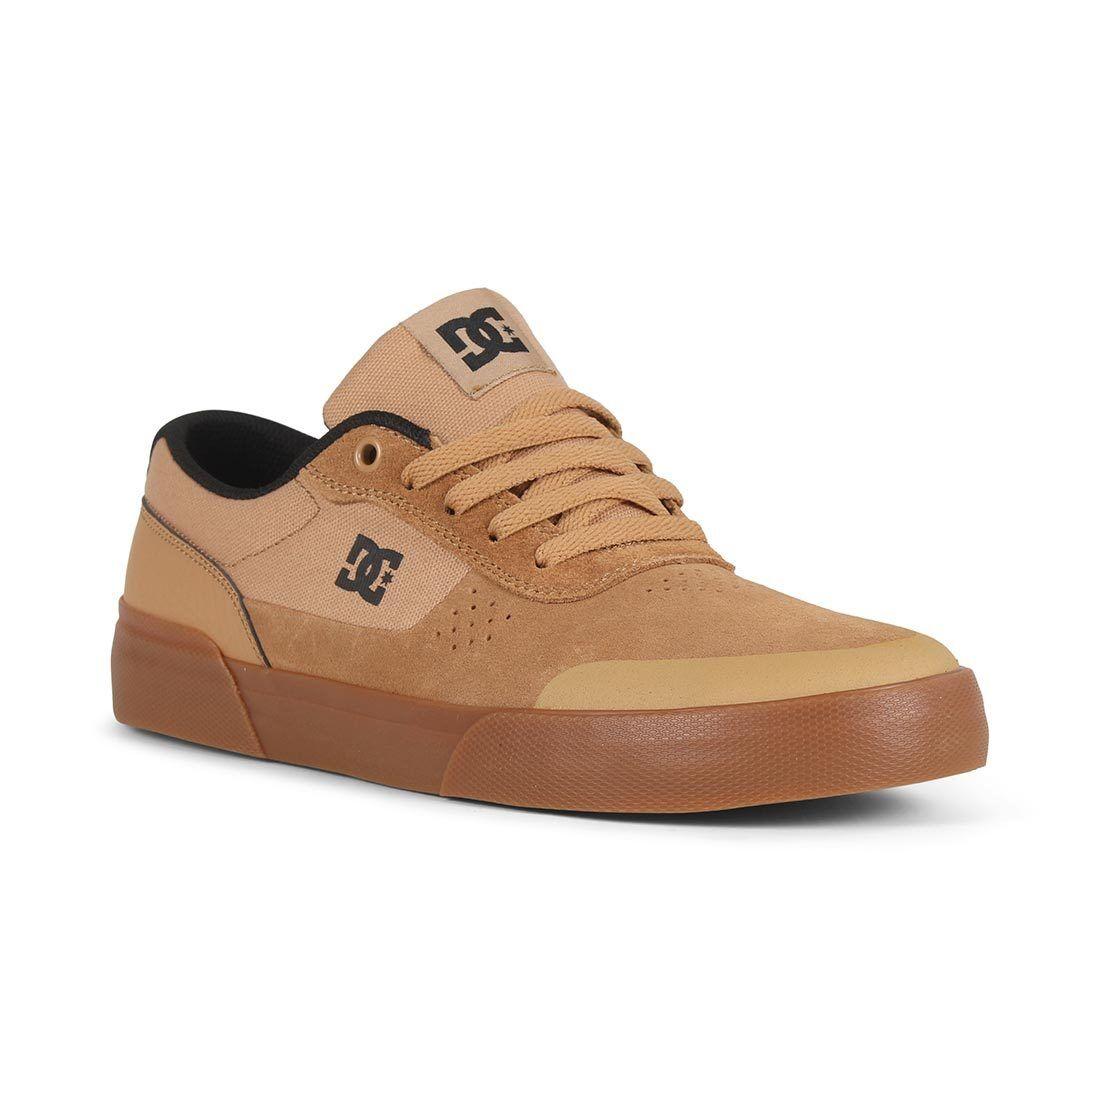 DC Schuhes Switch Plus S - Braun / Gum